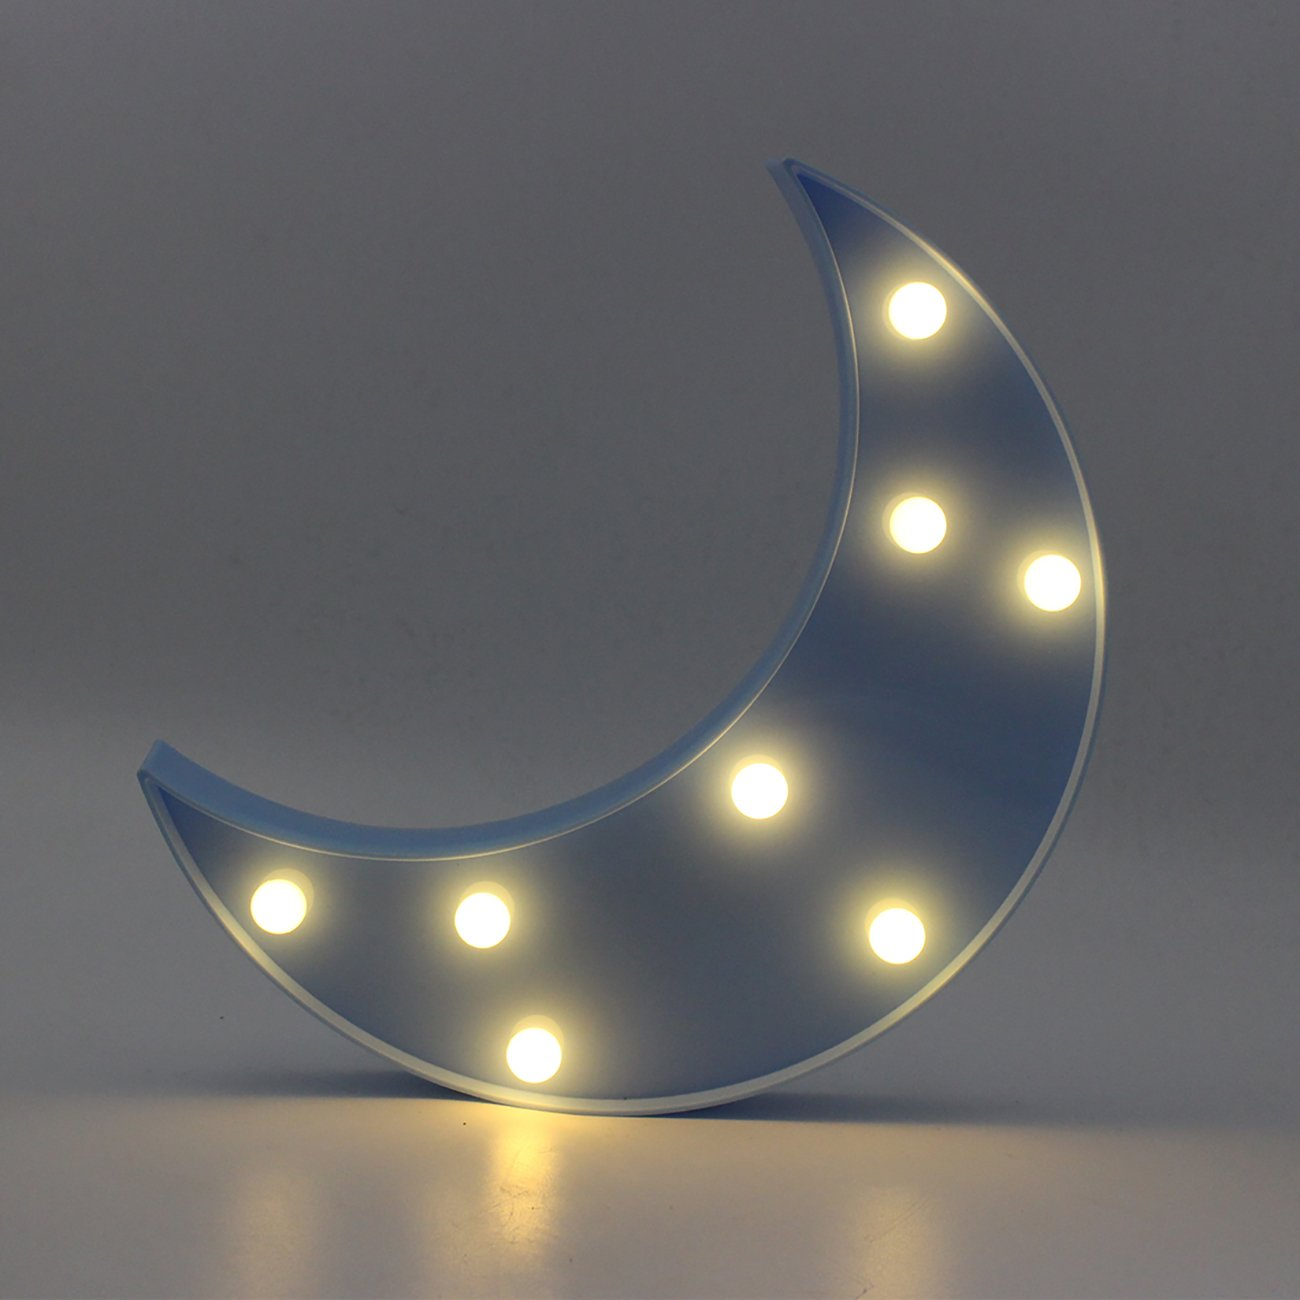 YAEer 3d面白いブラック矢印LEDナイトライト装飾ライトサイン子供赤ちゃんの部屋、パーティー、休日 ブルー、as Kidギフト B07CQNFSNY ブルー Y3DNL-27 YAEer ブルームーン B07CQNFSNY, 【人気商品】:924f6d89 --- ijpba.info